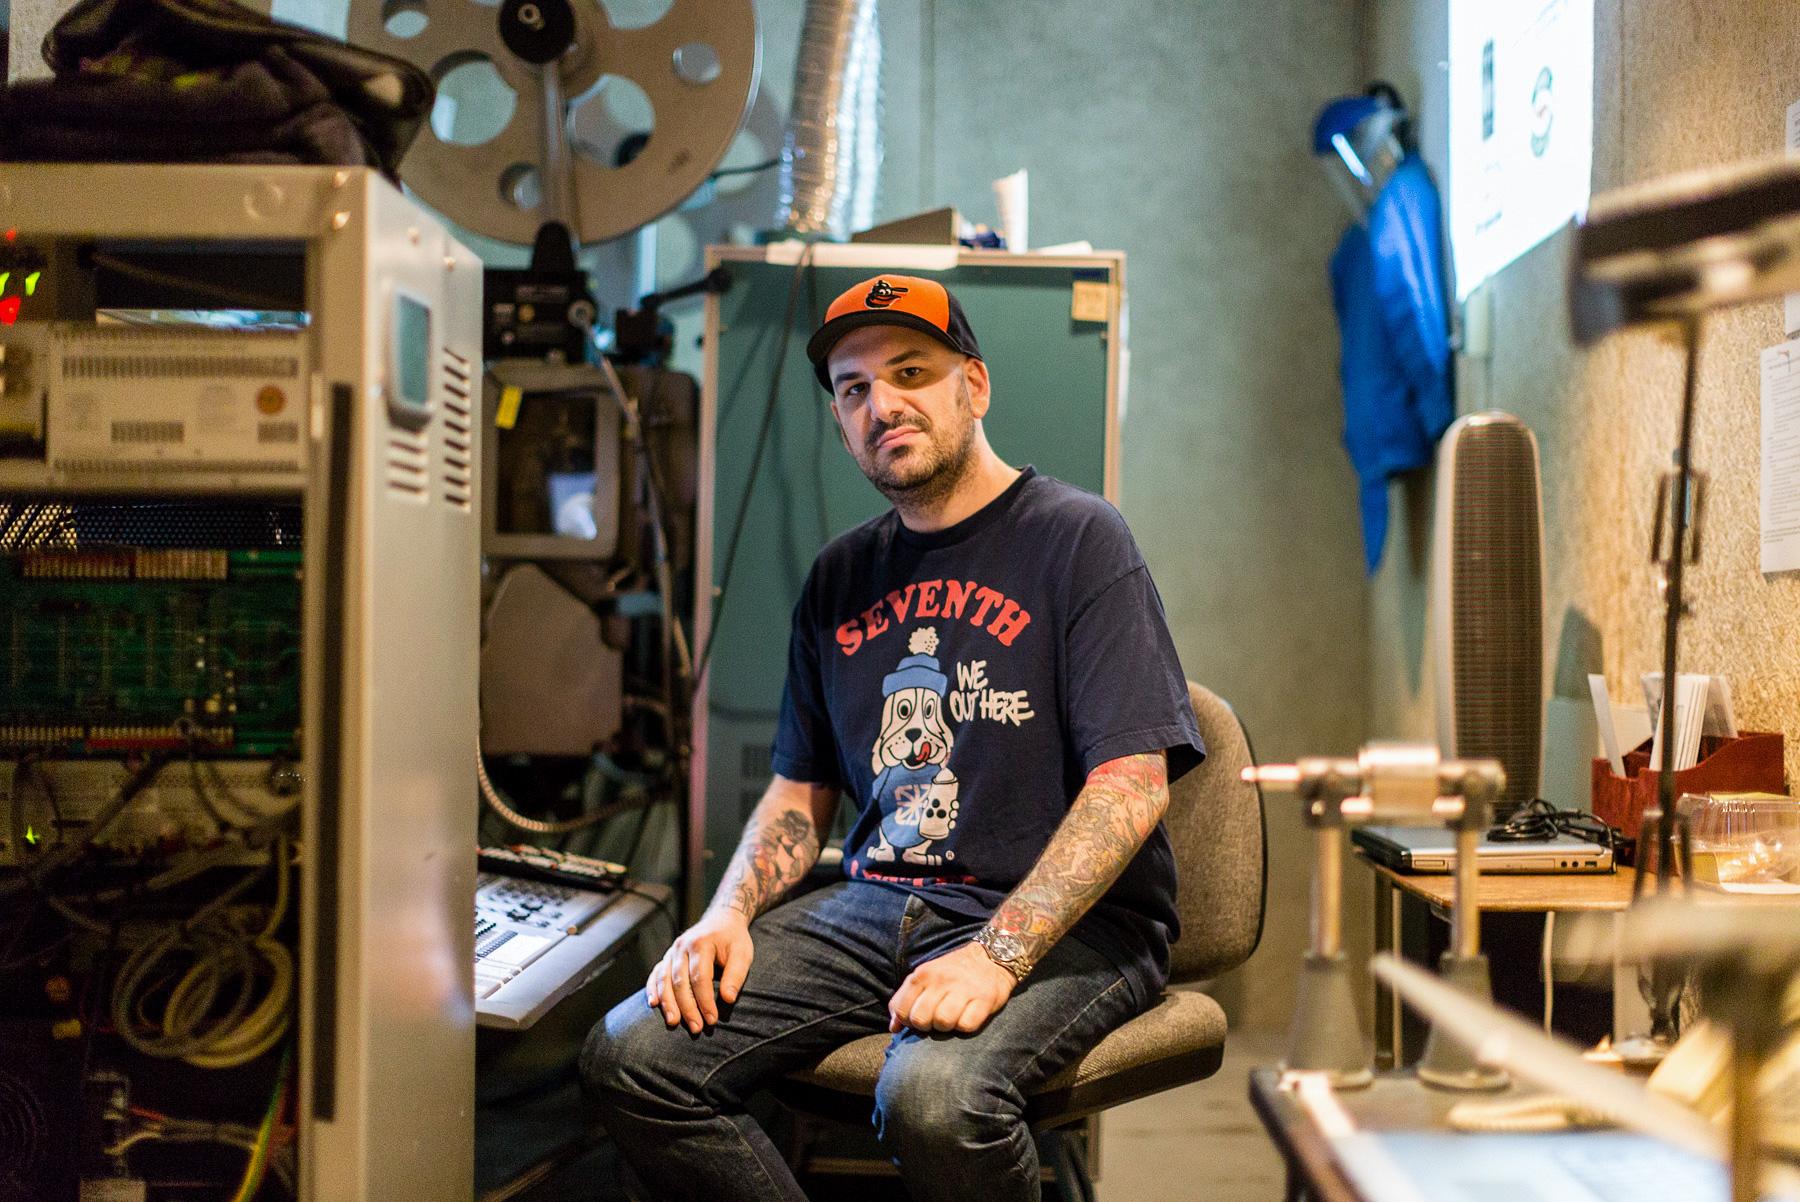 roger gastman discuses graffiti versus street art go go culture and the legend of cool disco dan